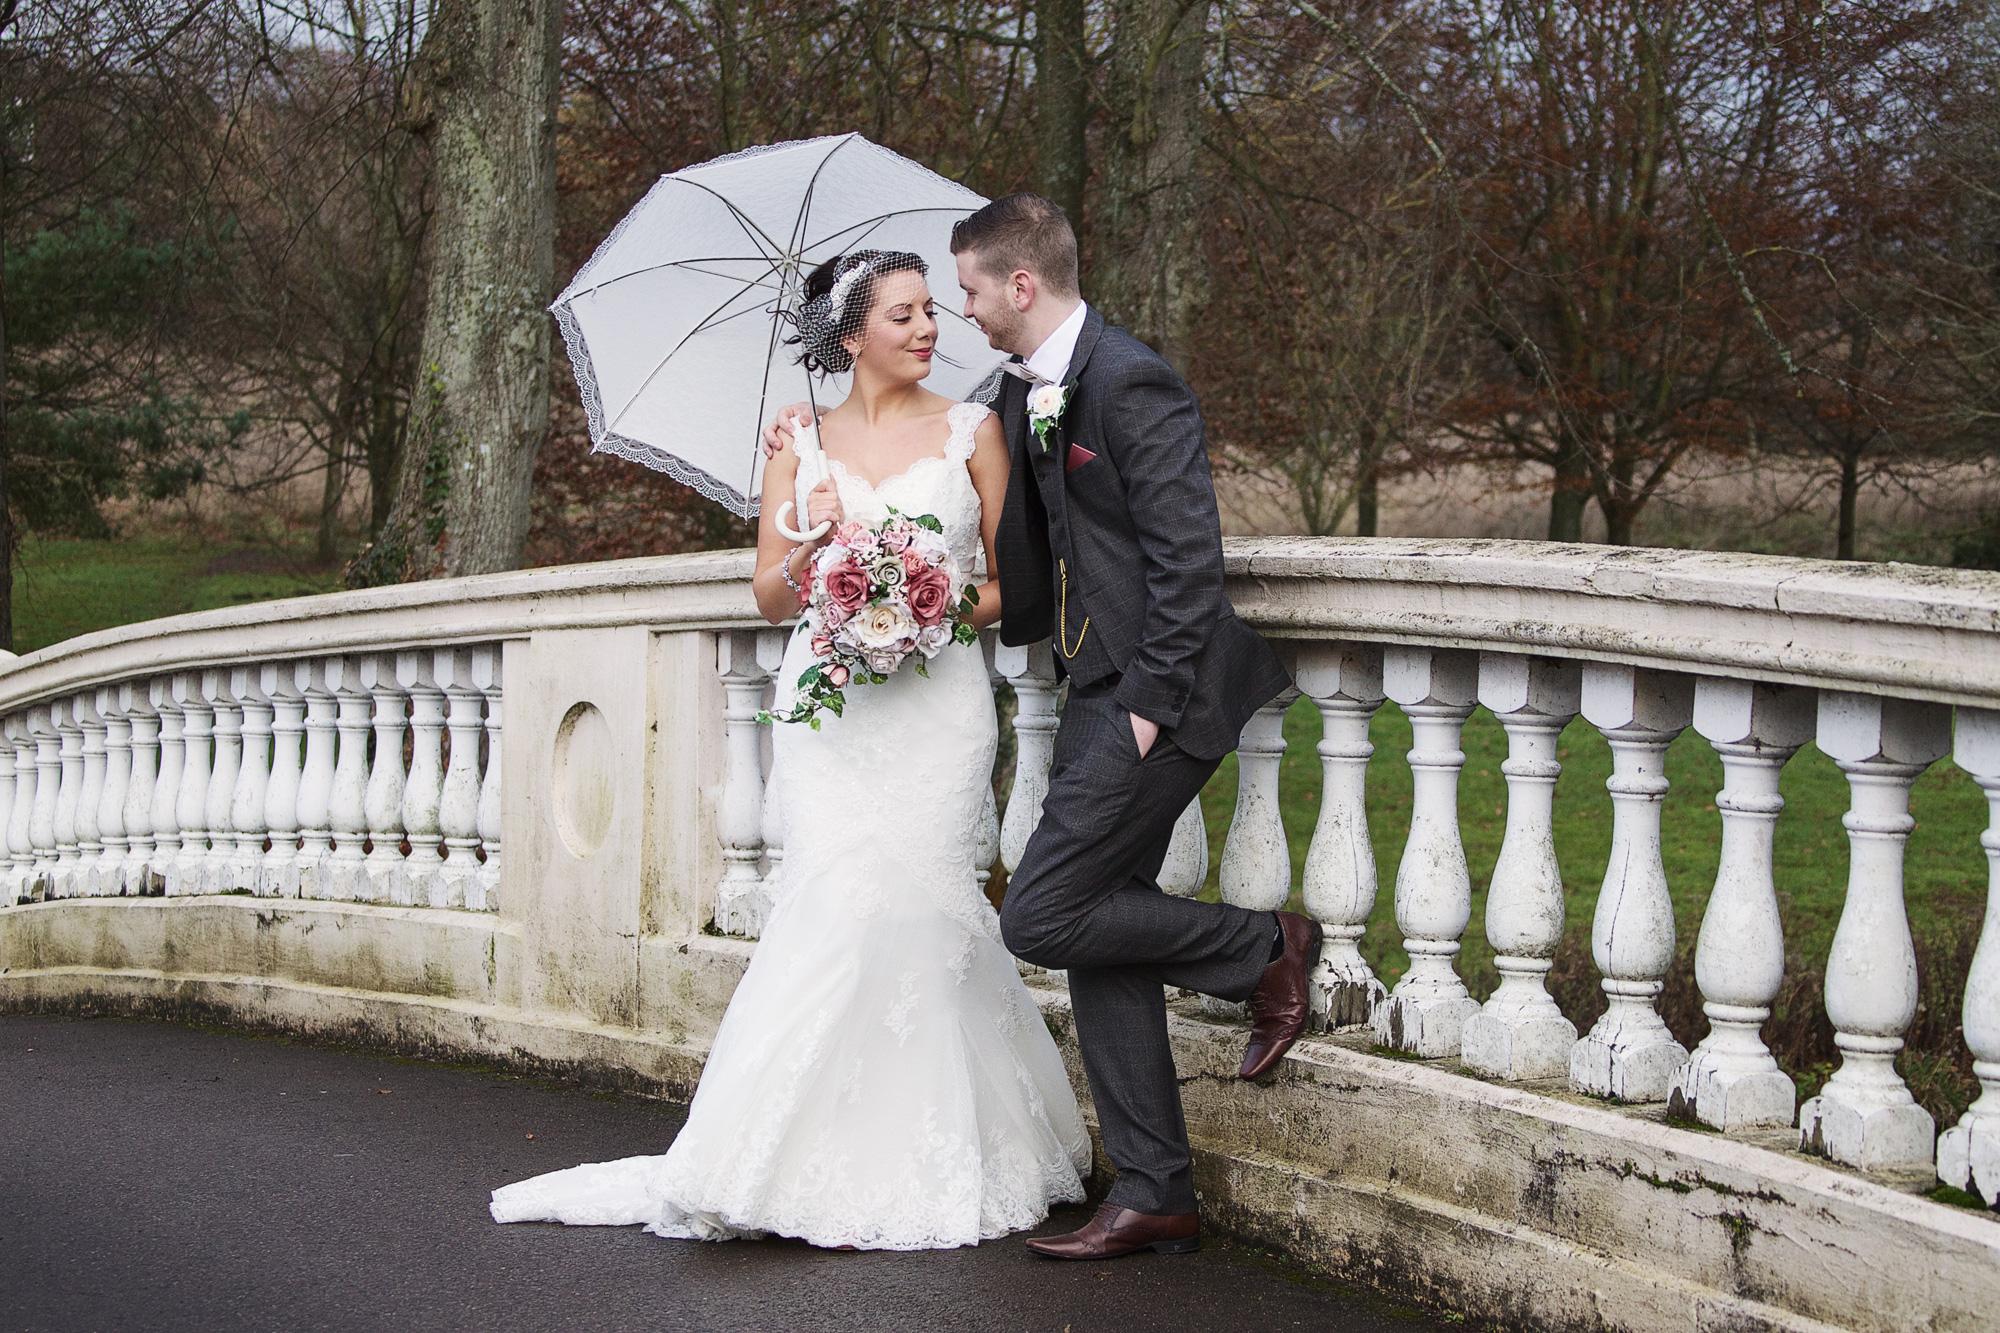 Adam_Hillier_Wedding_Photographer_Newbury_Berkshire_2 (5).jpg